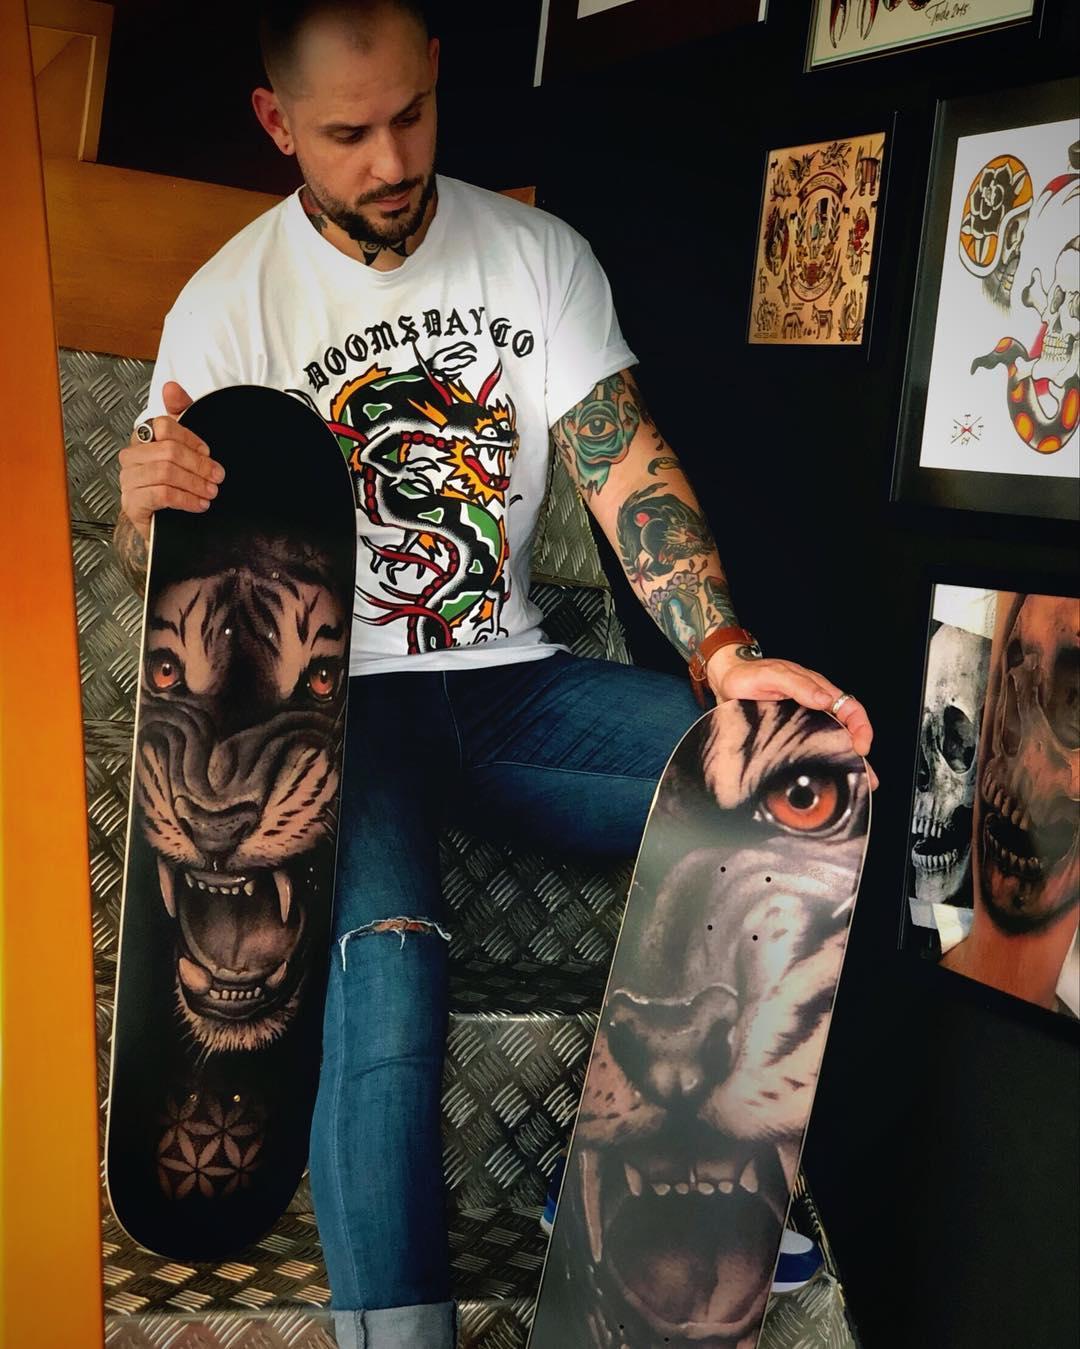 followforfollow,followmeciudadreal,ciudadreal,tomelloso,almagro,puertollano,tatuajesenpuertollano,tatuajesendaimiel,ciudadrealtattoo,ciudadrealtatuajes,tatuajesciudadreal,follow,ciudadrealtatuajes,puertollano,ciudadreal,tattoos,ciudadrealtattoo,tattooers,besttattooers,juantabasco,ciudadrealsetatua,ink,tatuajes,realismo,realistictattoo,ciudadrealtattoo,tatuajesenpuertollano,traditionaltattoos,castillalamancha,inked,inkedlife,inkedsociety,art,amazingink,tattooart